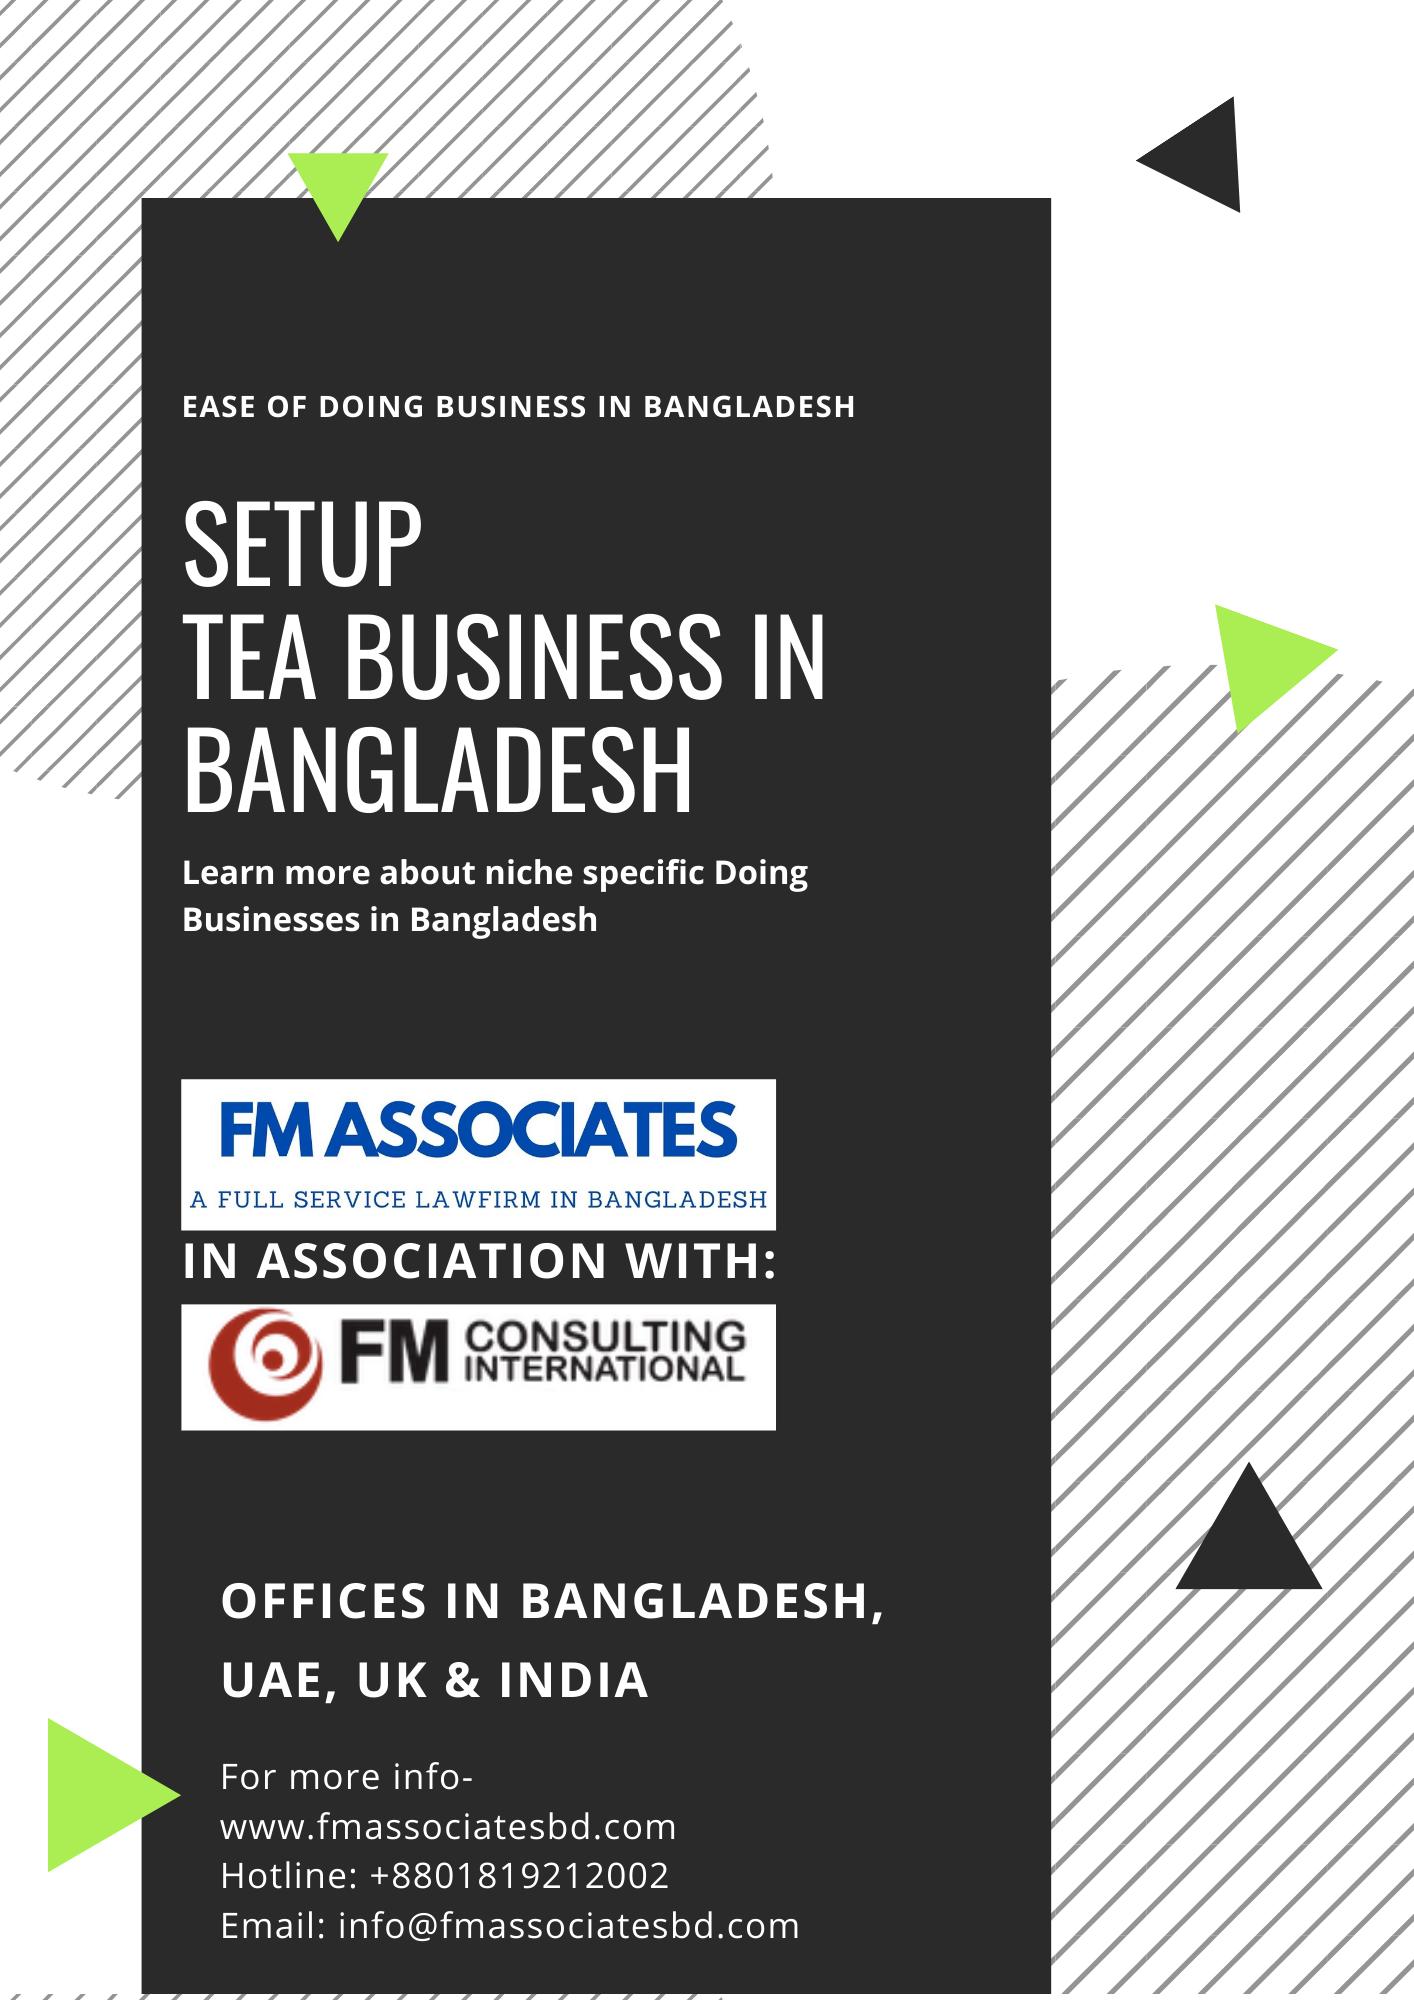 How to Setup Tea Business in Bangladesh